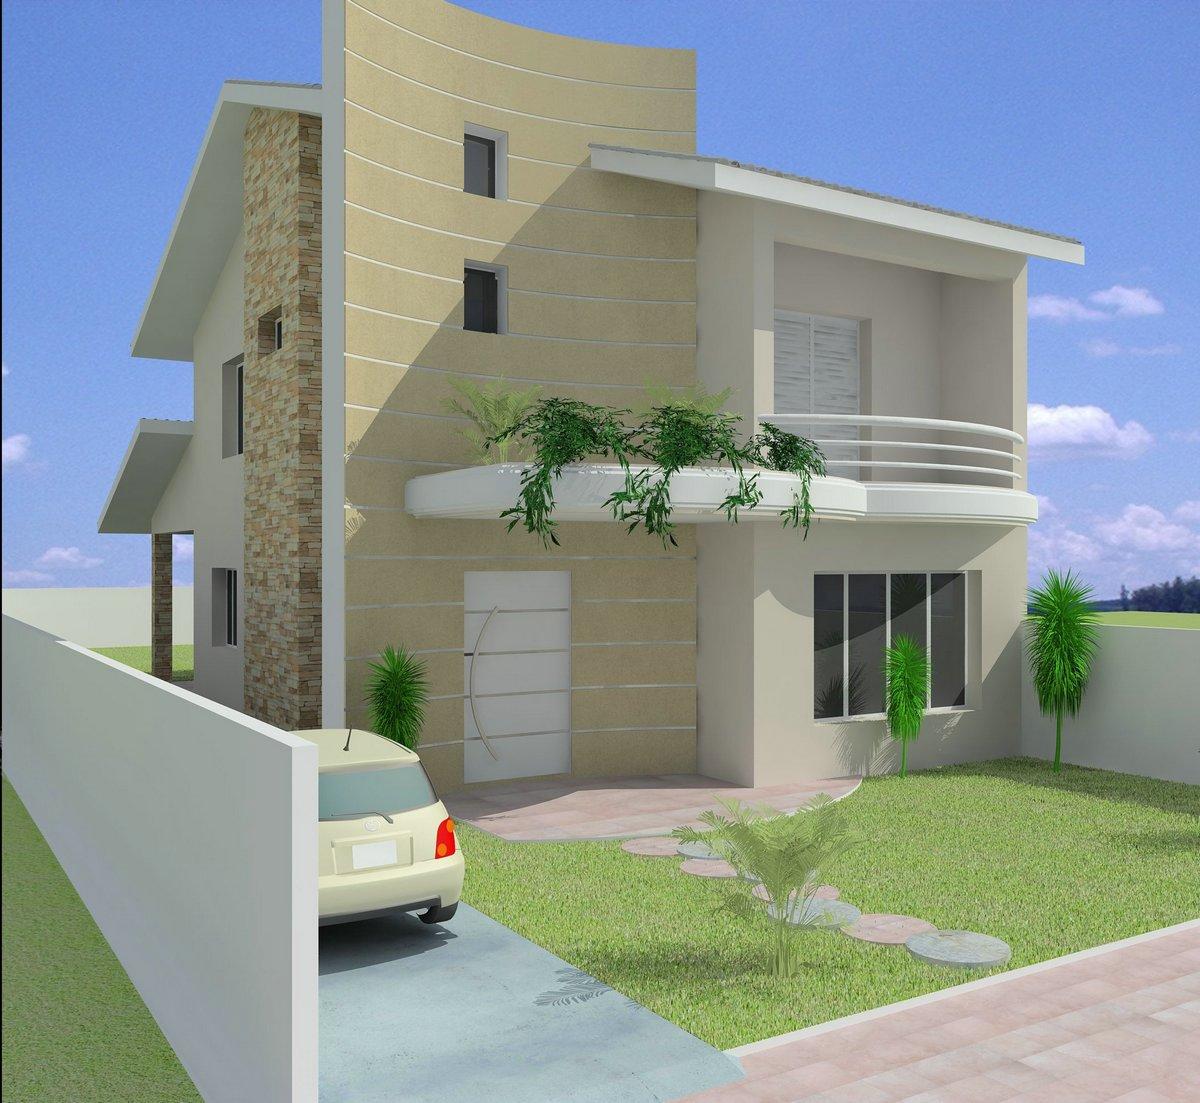 11 modelos de fachadas de sobrados modernos for Modelos de fachadas modernas